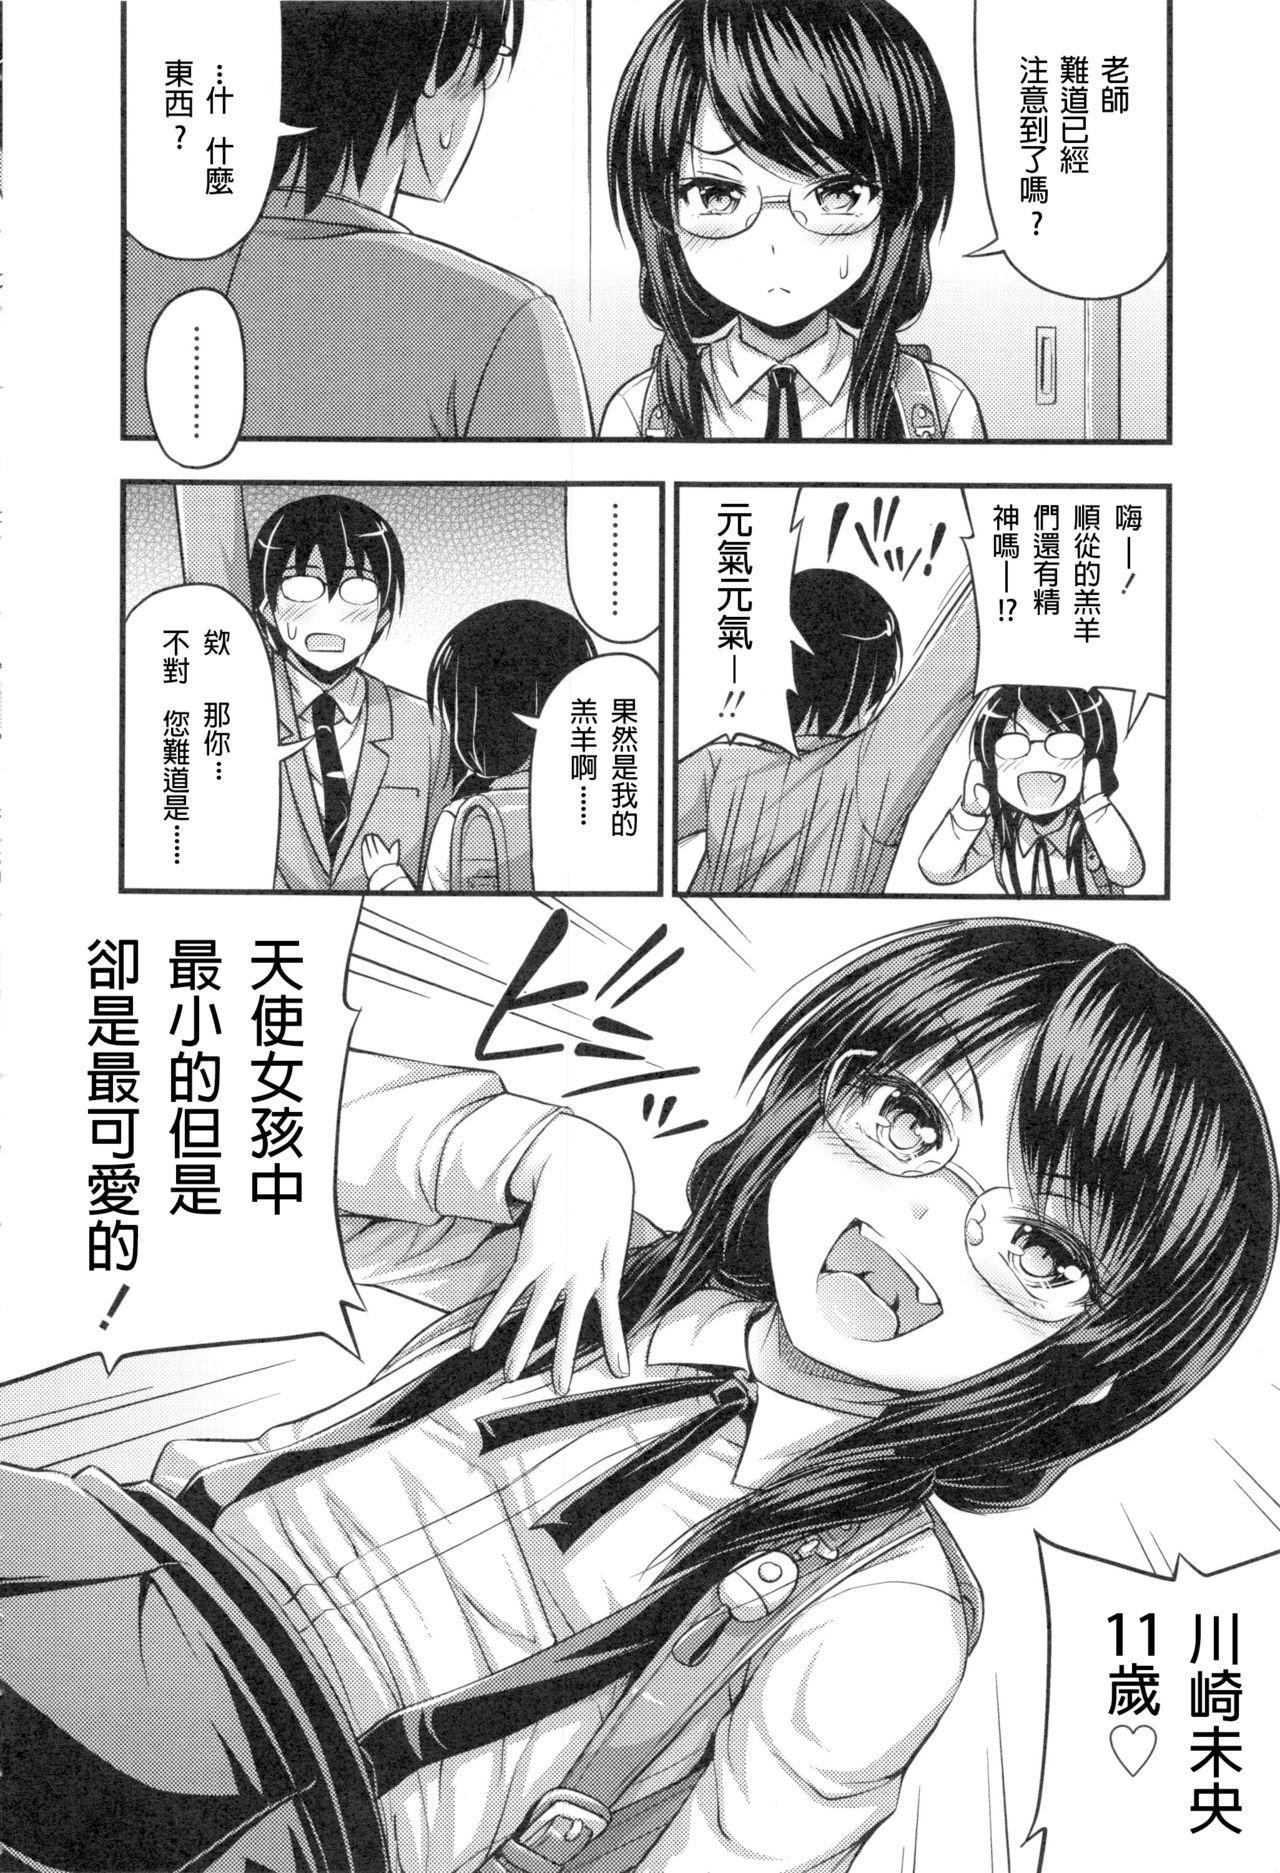 Onii-chan Sonna ni Short Pants Suki nano? 47